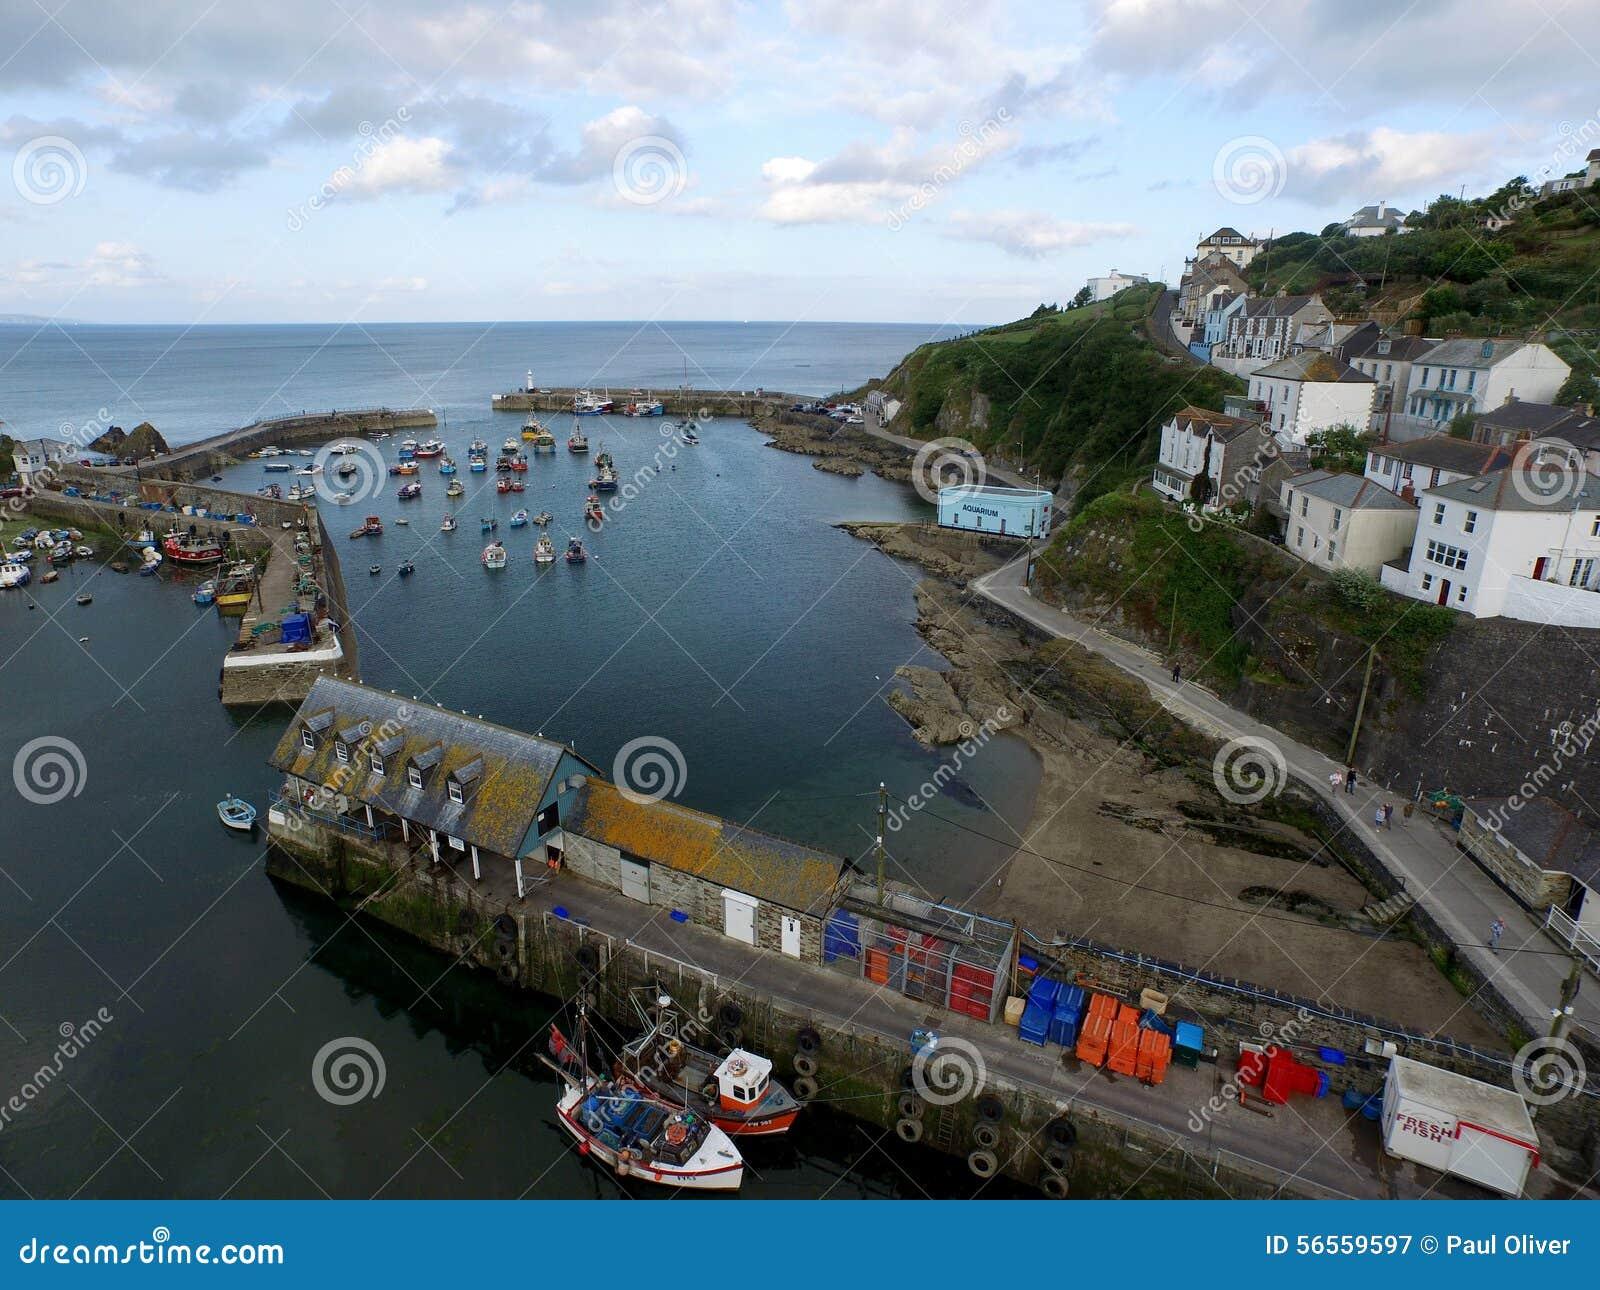 Download Λιμάνι αλιείας Mevergissey στοκ εικόνα. εικόνα από πλάνο - 56559597